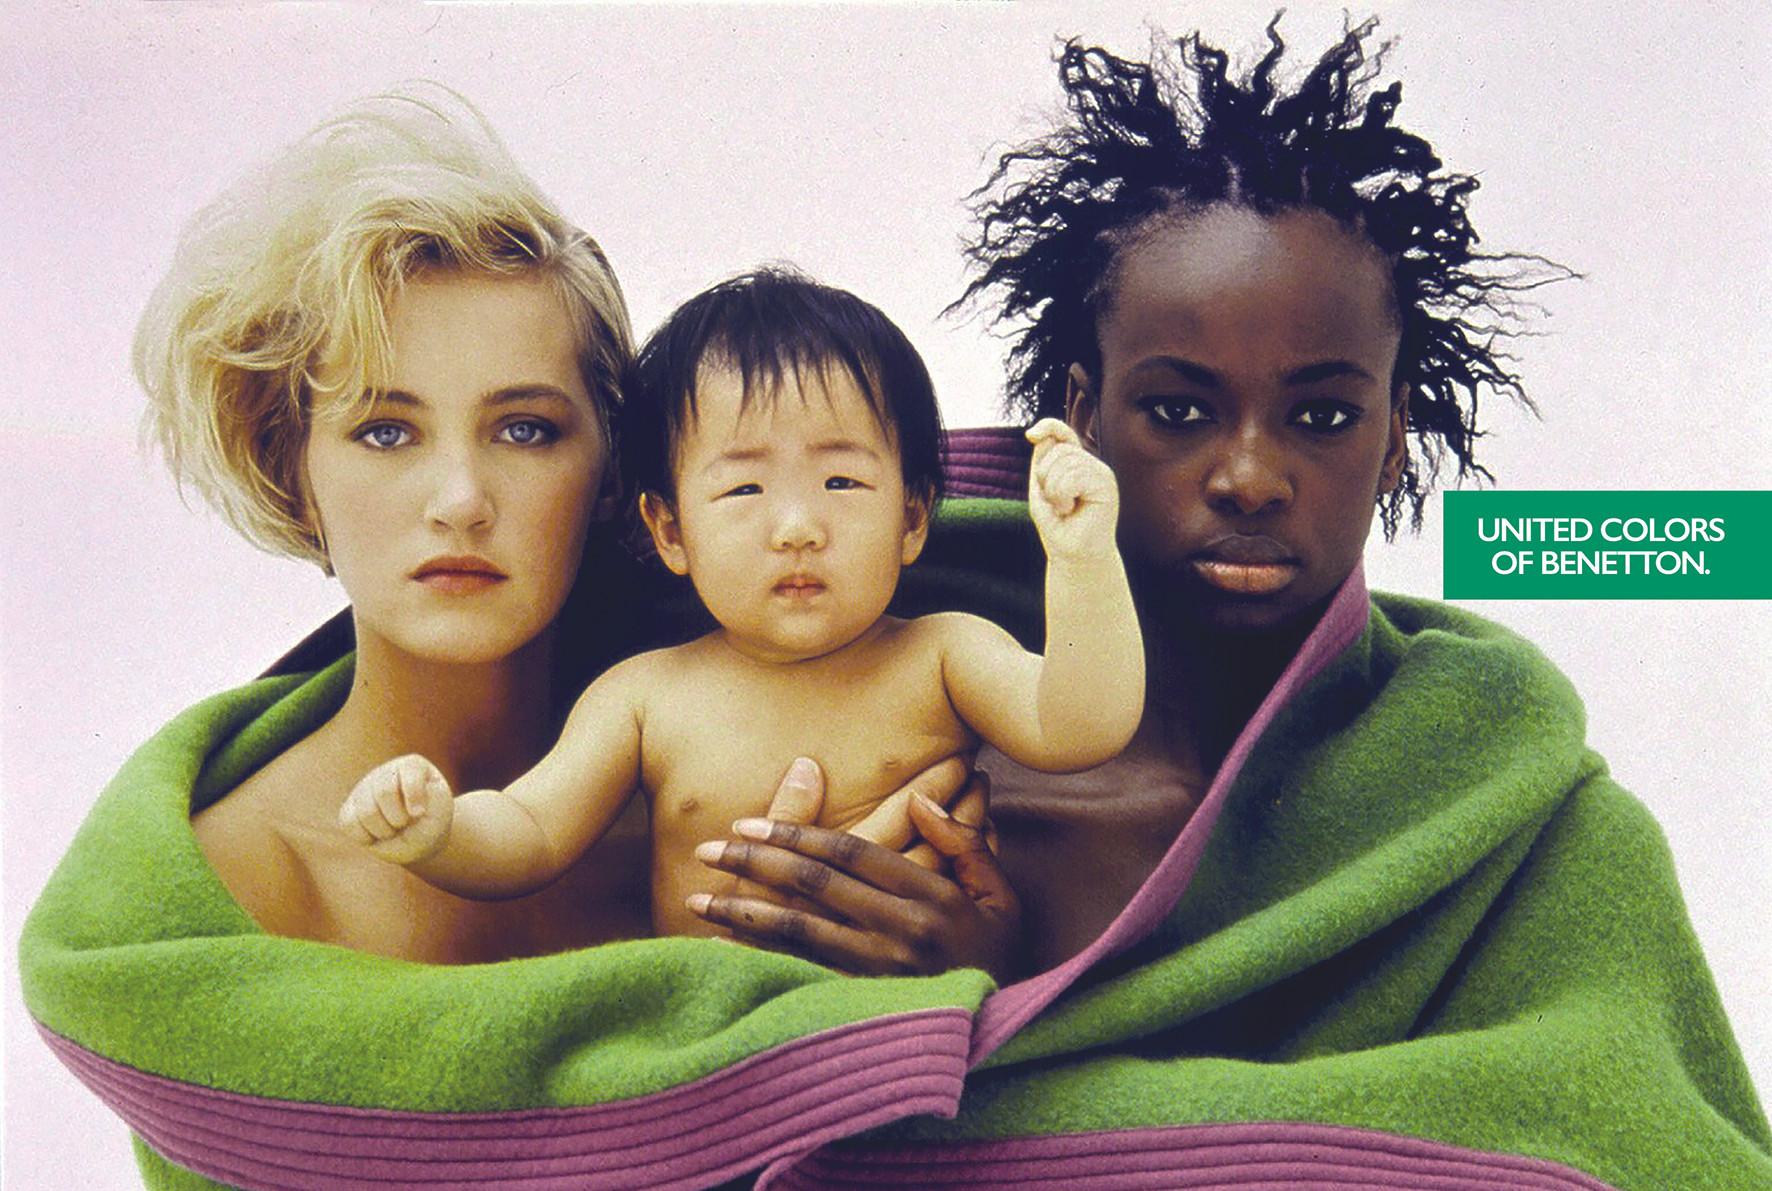 Benetton - JungleFever (1992)